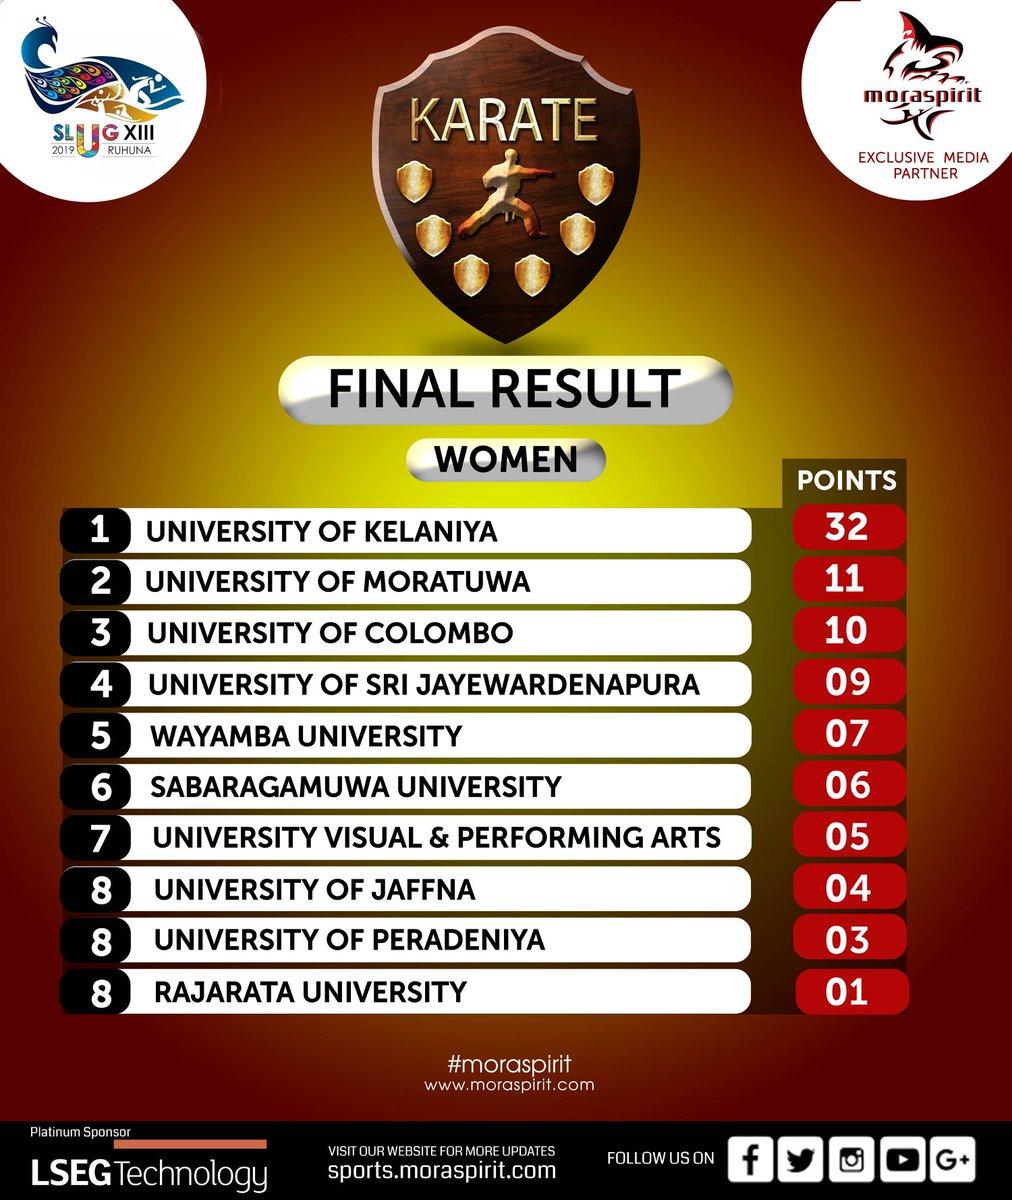 SLUG XIII 2019 - Karate  FINAL RESULTS -WOMEN  For more details please visit our official SLUG XIII web site: https://t.co/yOxNoOkUkF  #MoraSpirit #SLUG #slugxiii #slug2019 #Empowering_University_Sports #Karate_Katha #slug_karate #Updates https://t.co/xD79EhFzgF